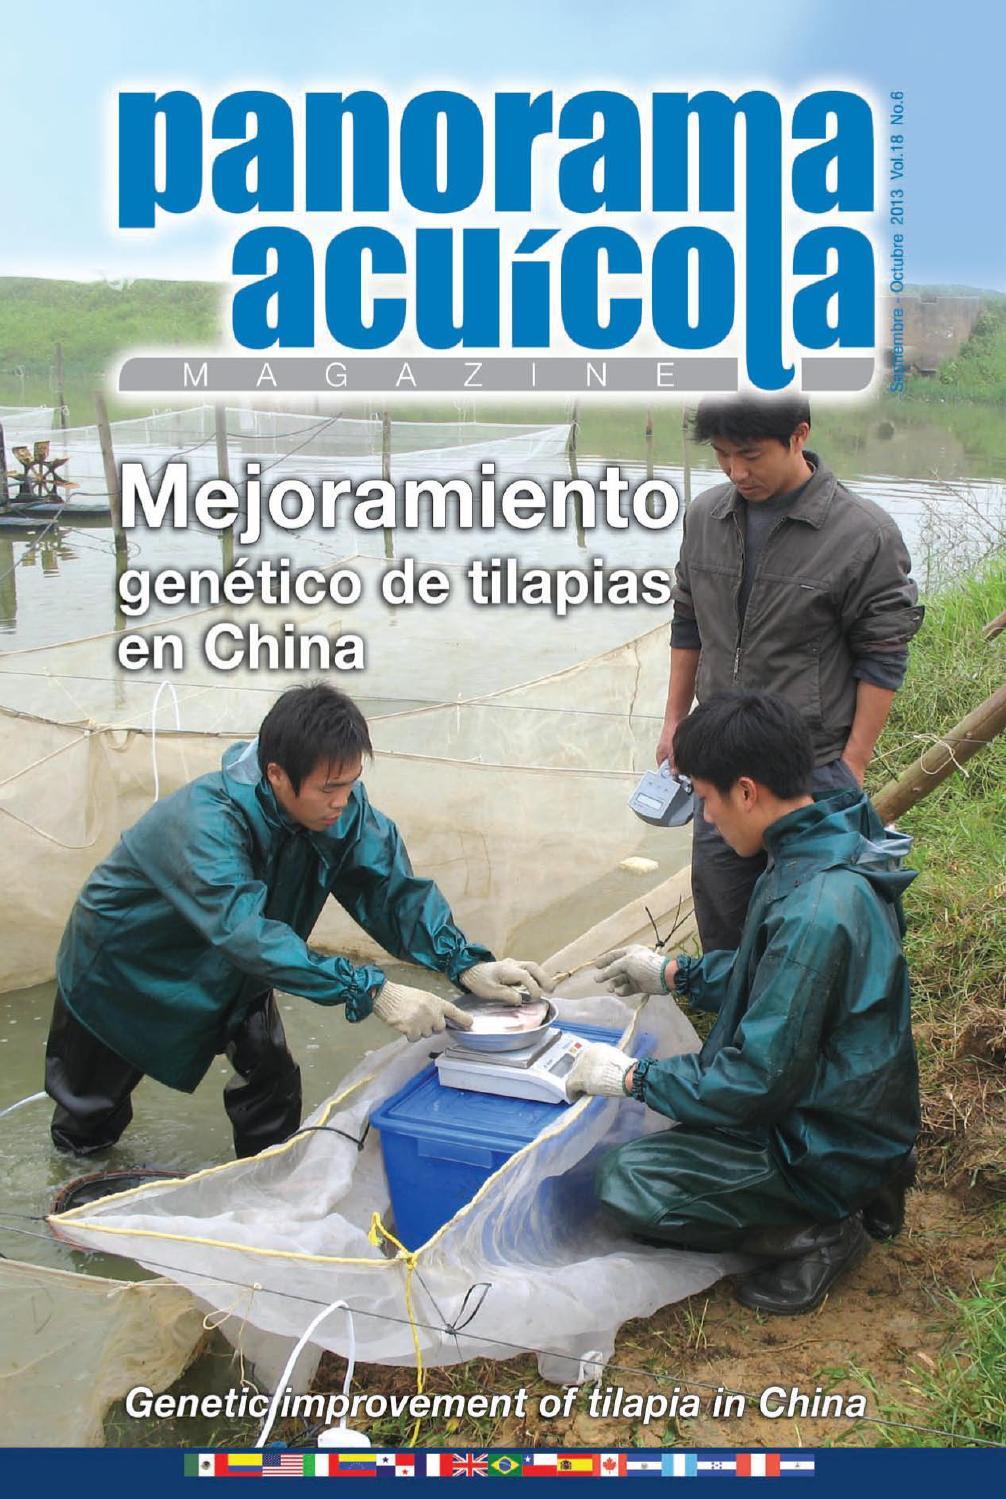 Panorama acuicola septiembre octubre vol 18 no 6 by for Tanques para cria de tilapia